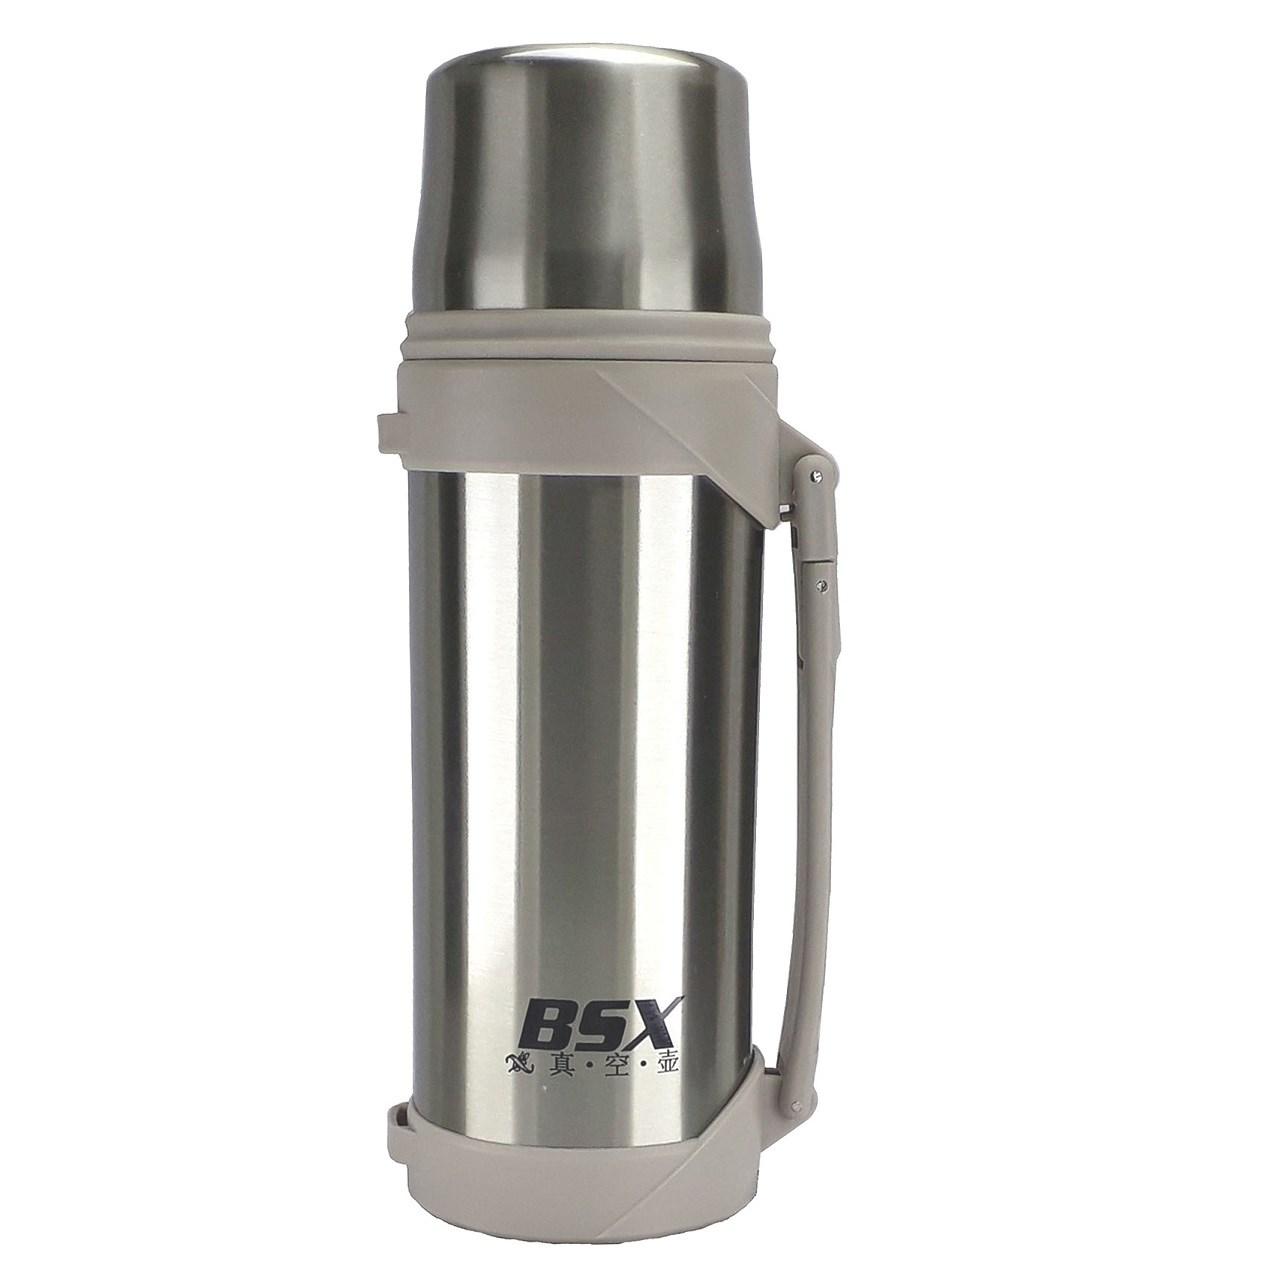 عکس فلاسک مدل BSX ظرفیت 1.2 لیتر